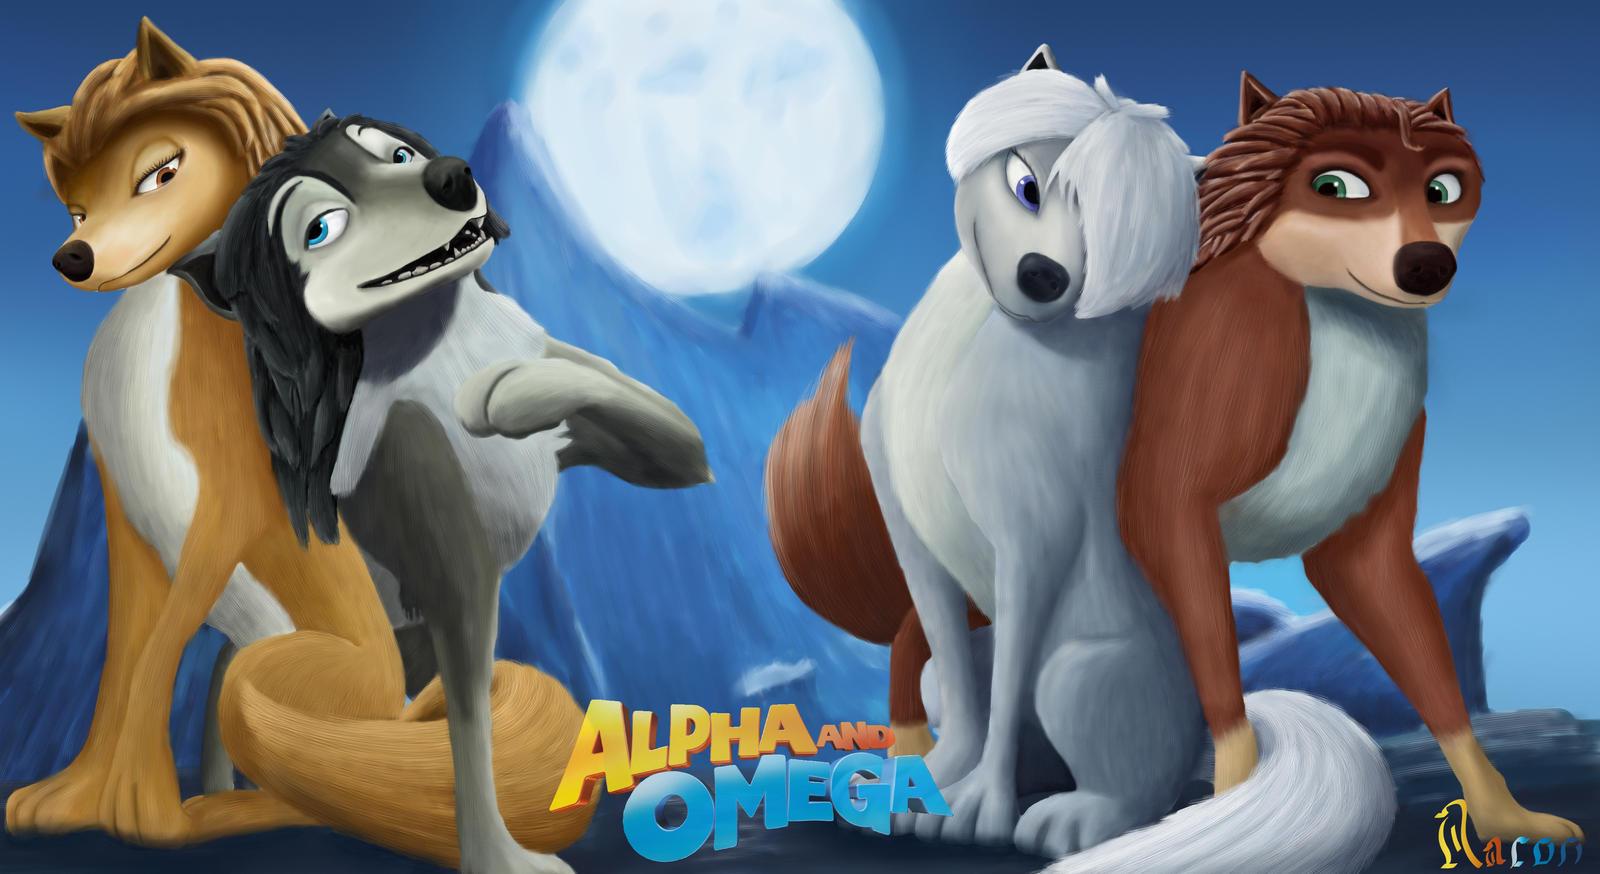 Alpha and Omega couples by Raynaron on DeviantArt